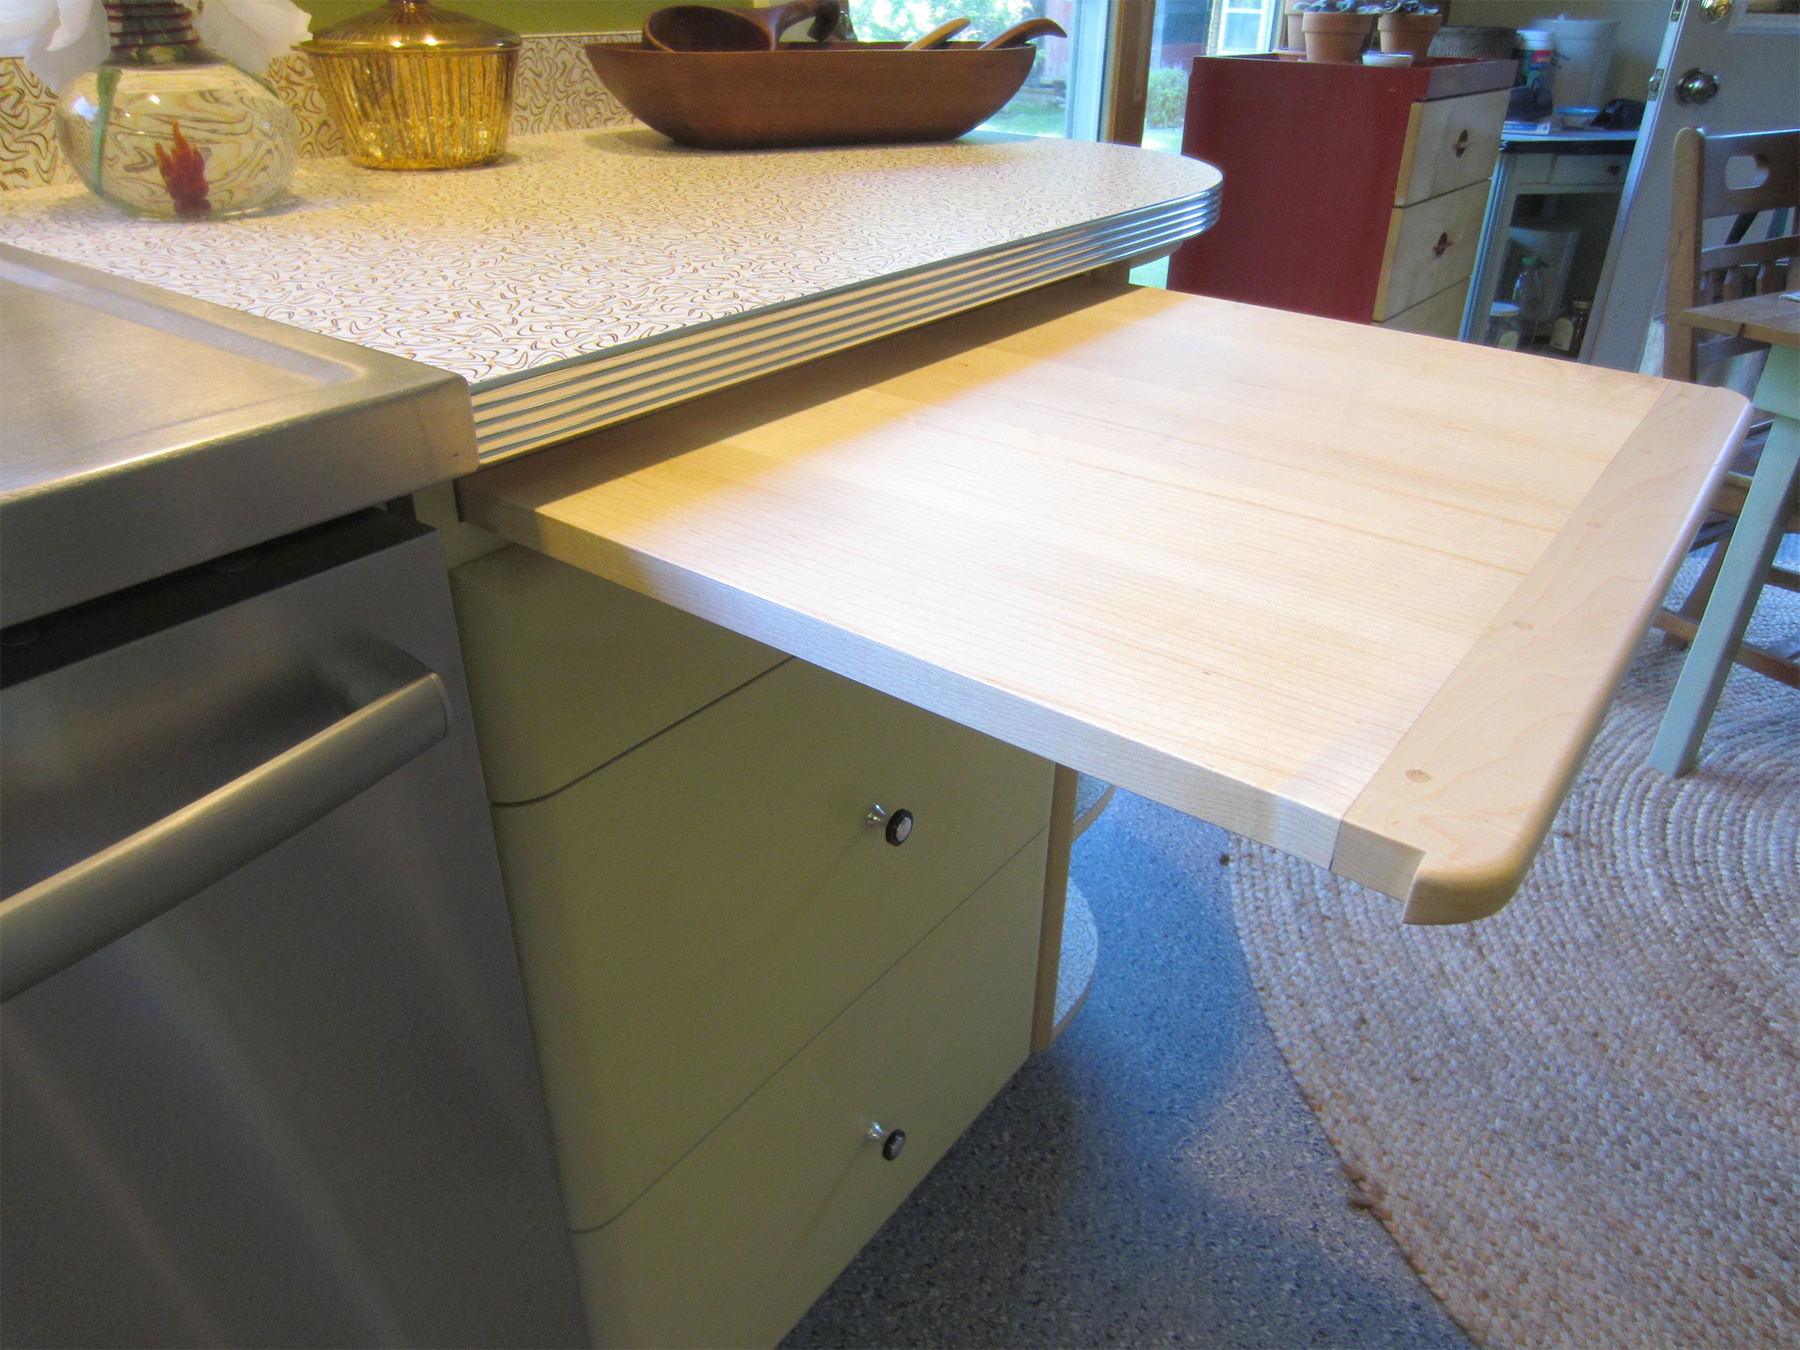 Oakledge kitchen-02: maple cutting board & Wilsonart boomerang laminate countertop with aluminum/chrome edging